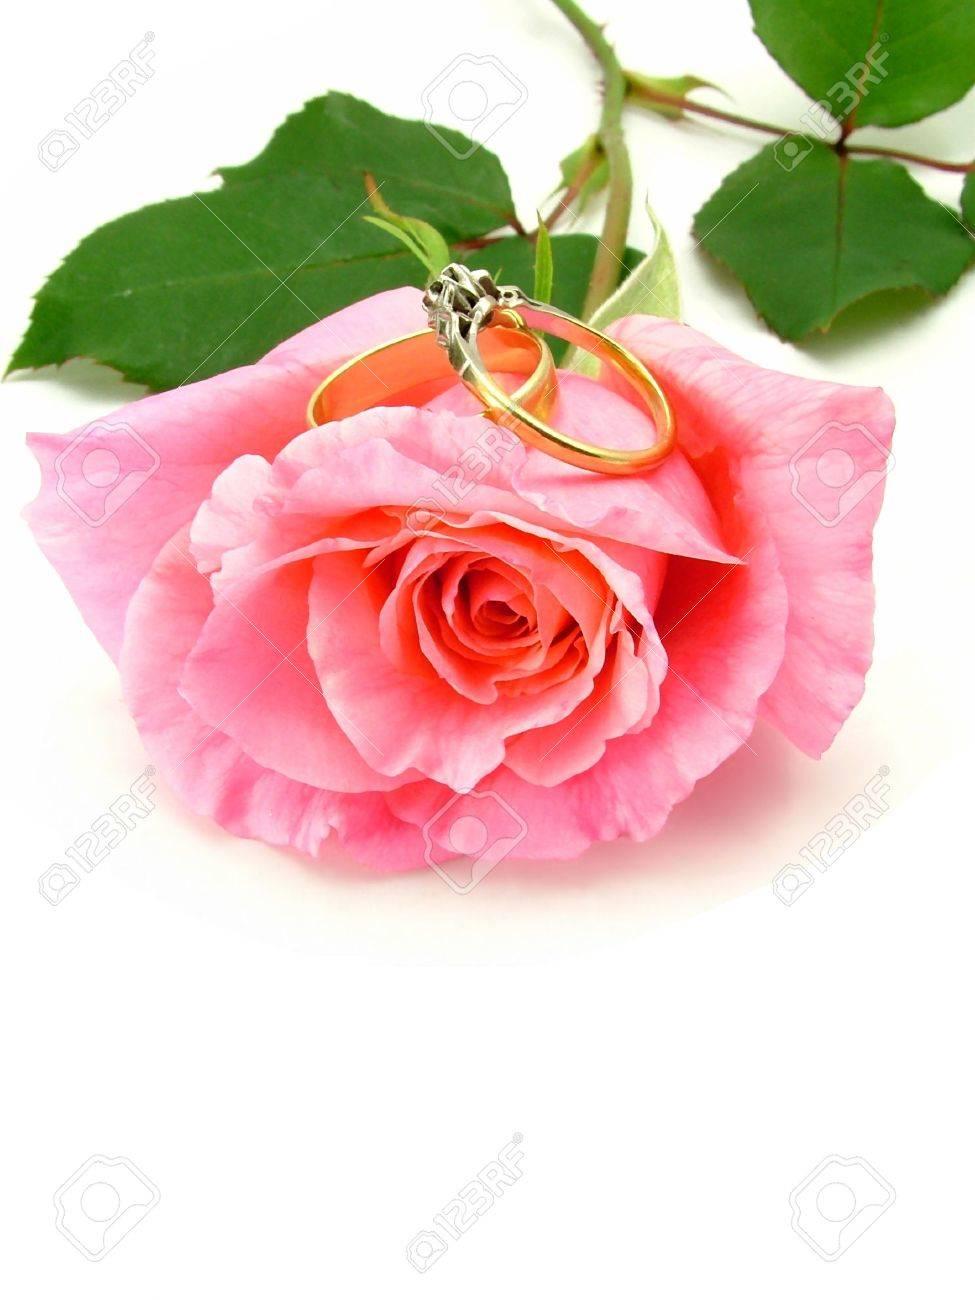 Wedding Rings Pictures: wedding rings on single rose petal